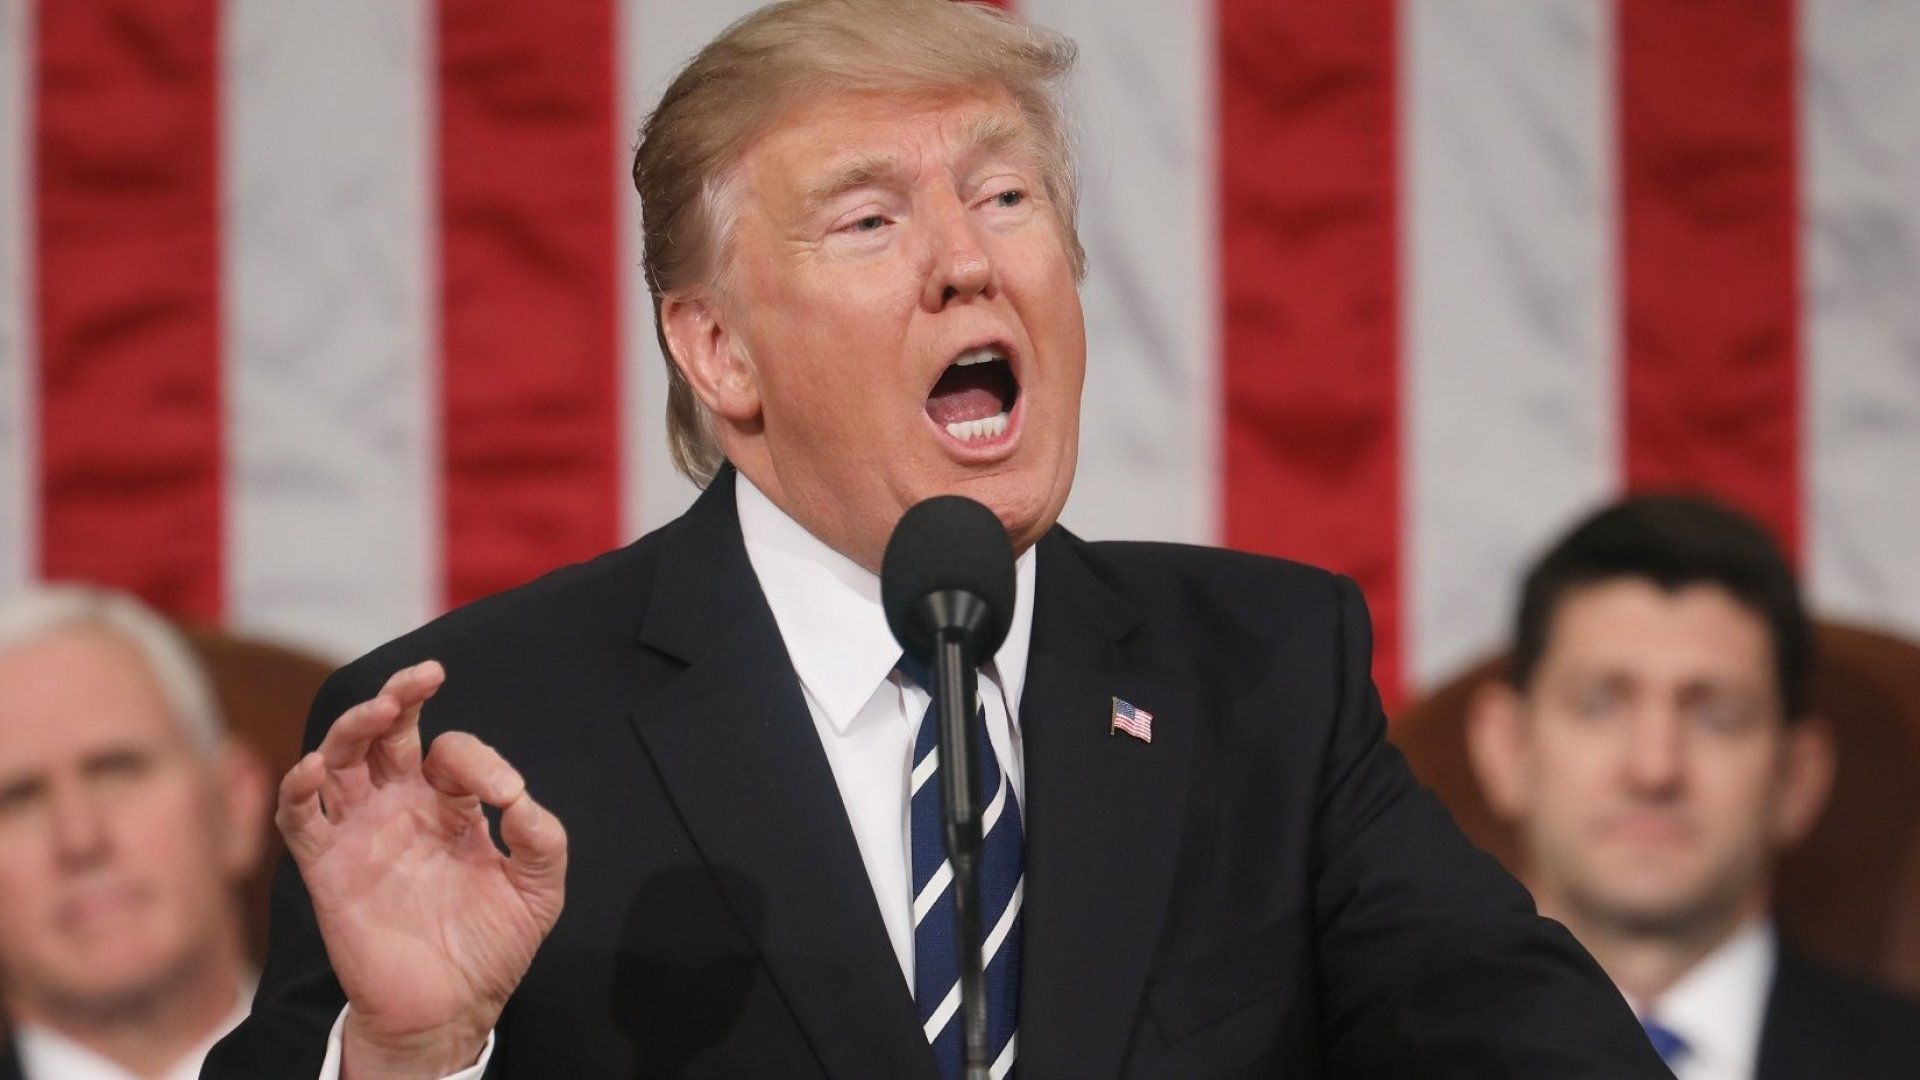 Entrepreneurs Get Little Notice in Trump Address